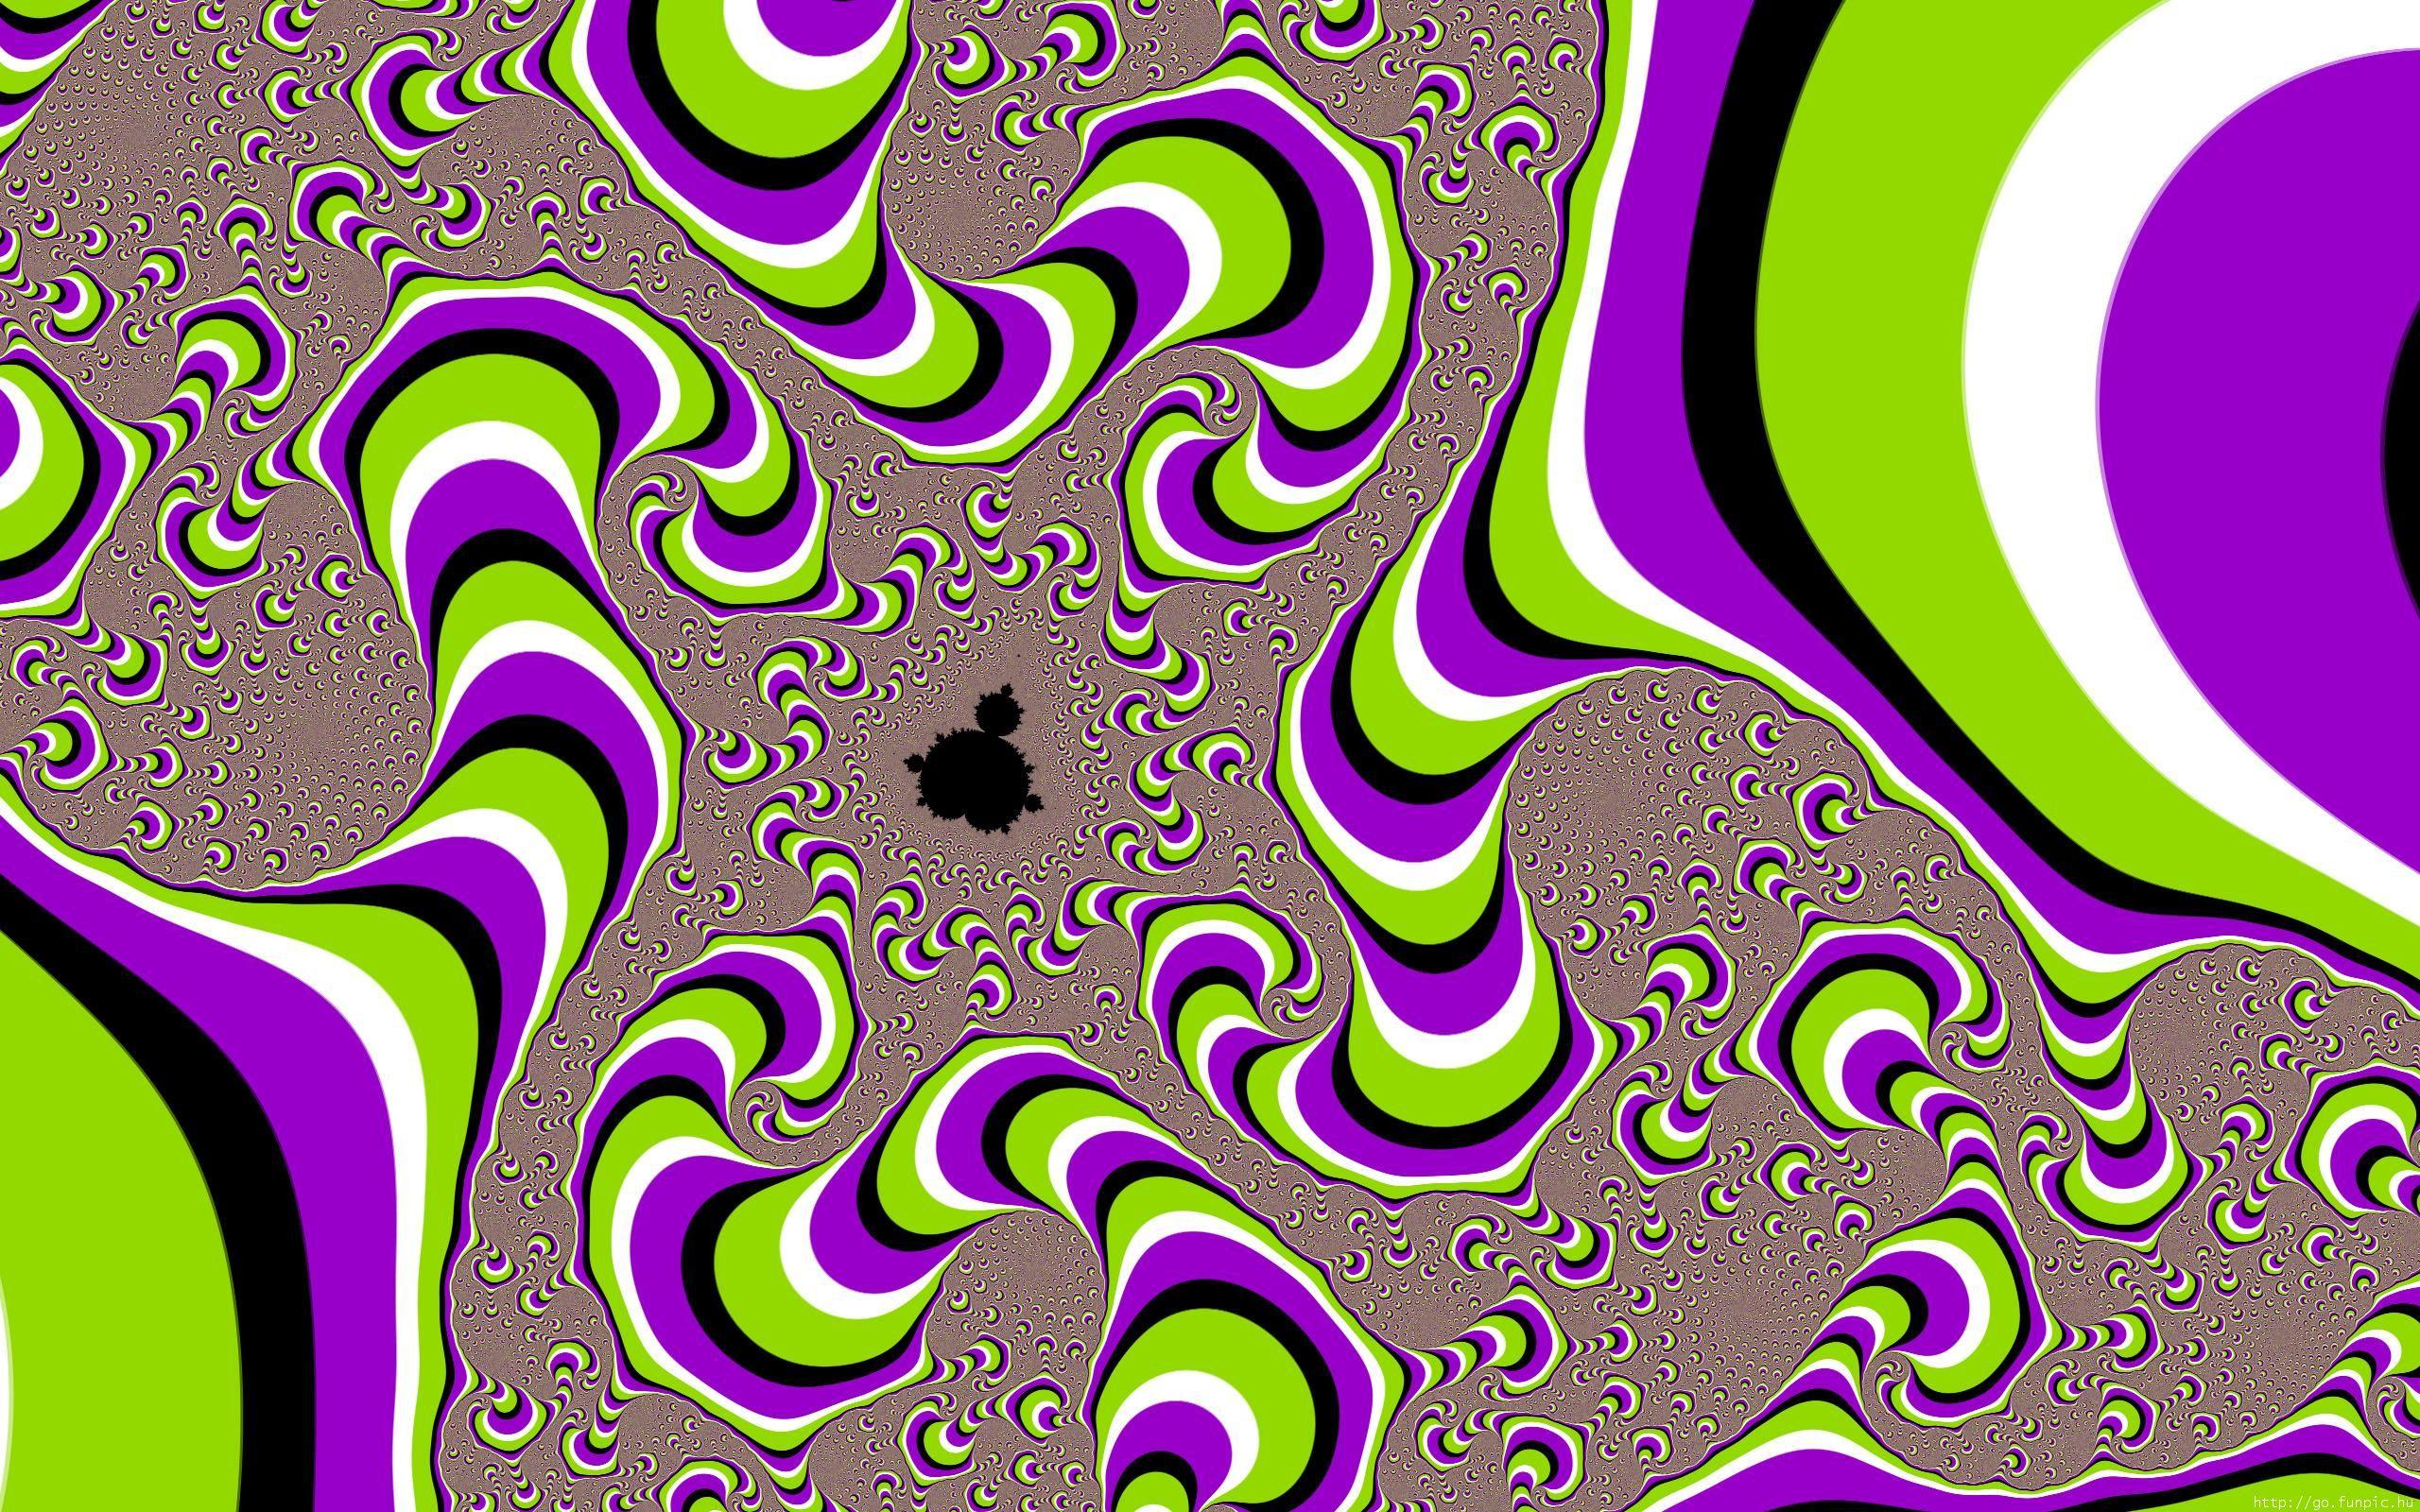 http://static.funpic.hu/_files/pictures/original/32/95/39532.jpg